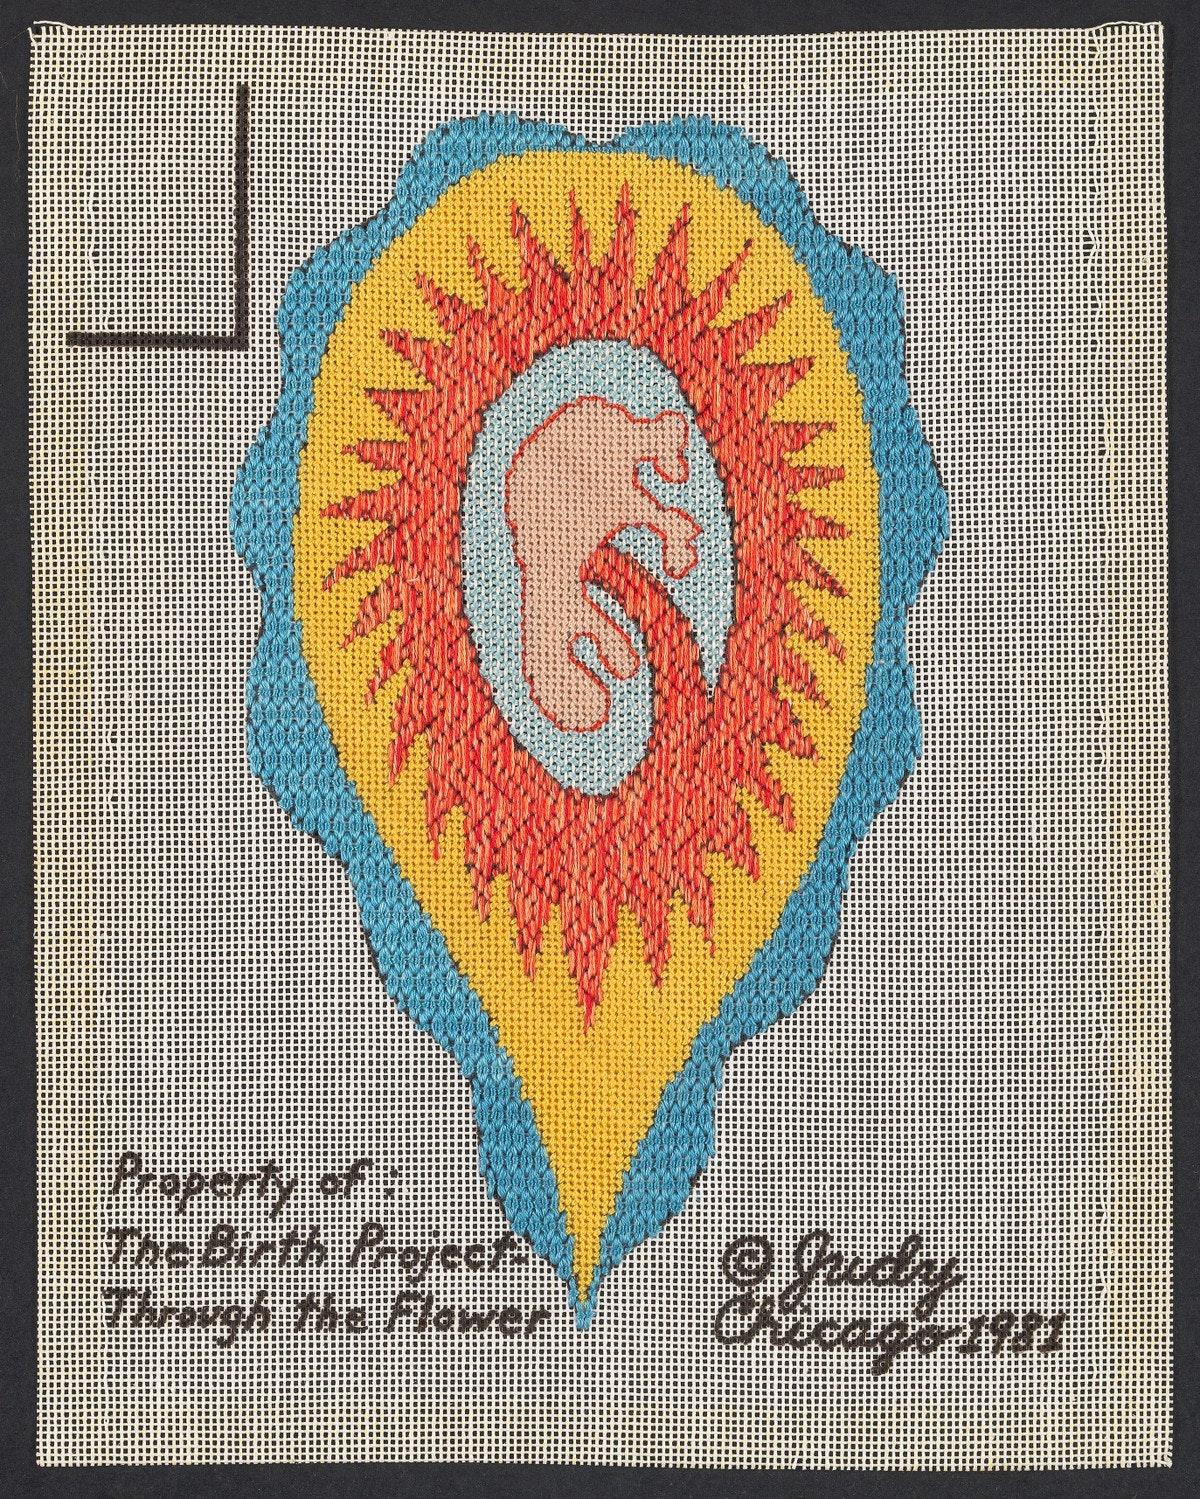 Birth Project sample